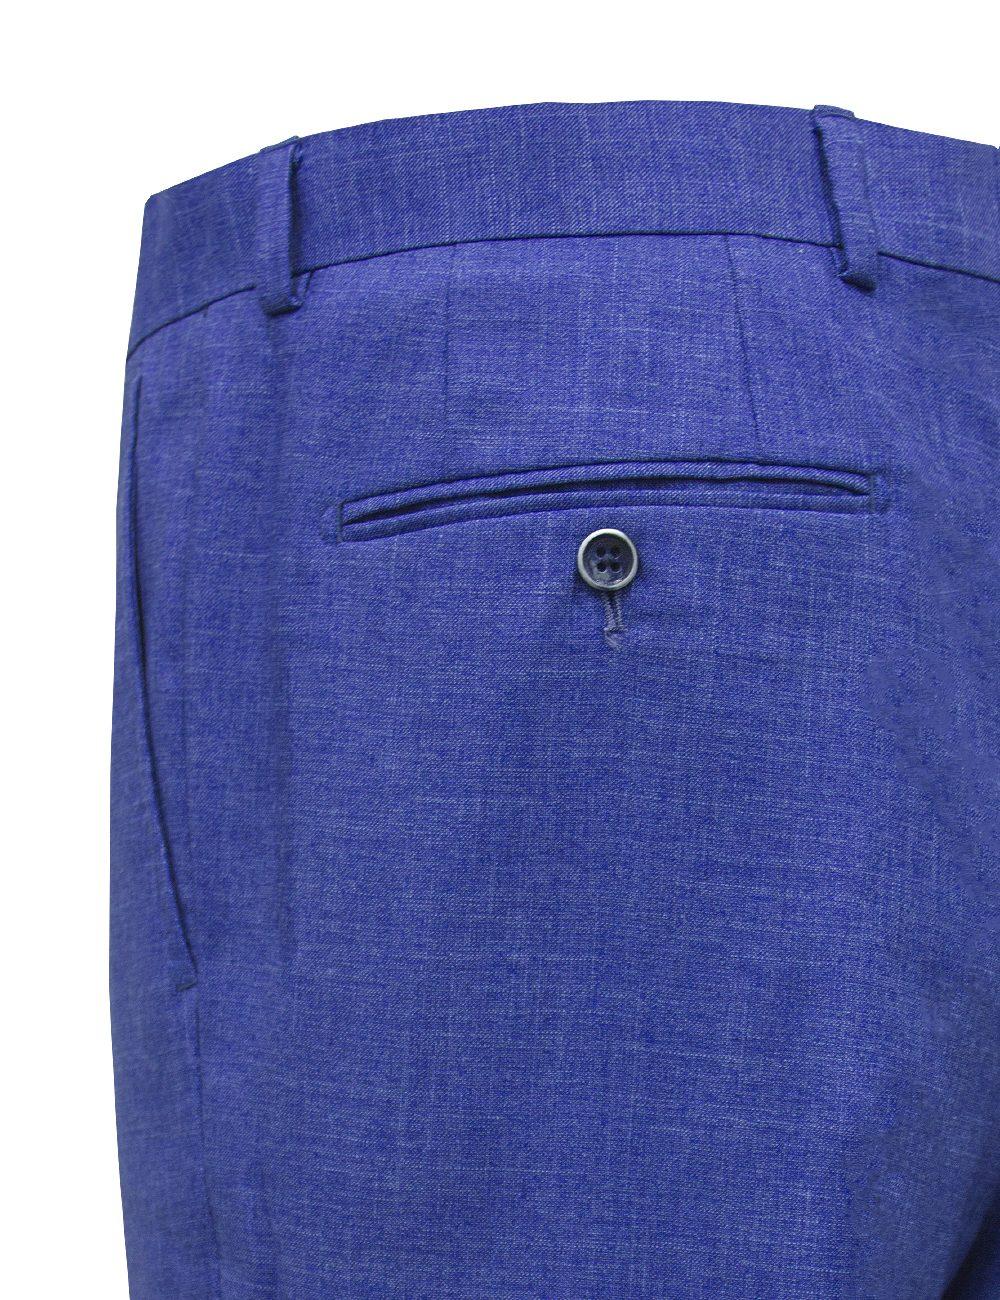 Modern / Classic Fit Colony Blue Dress Pants - SP8.3-SS8.3